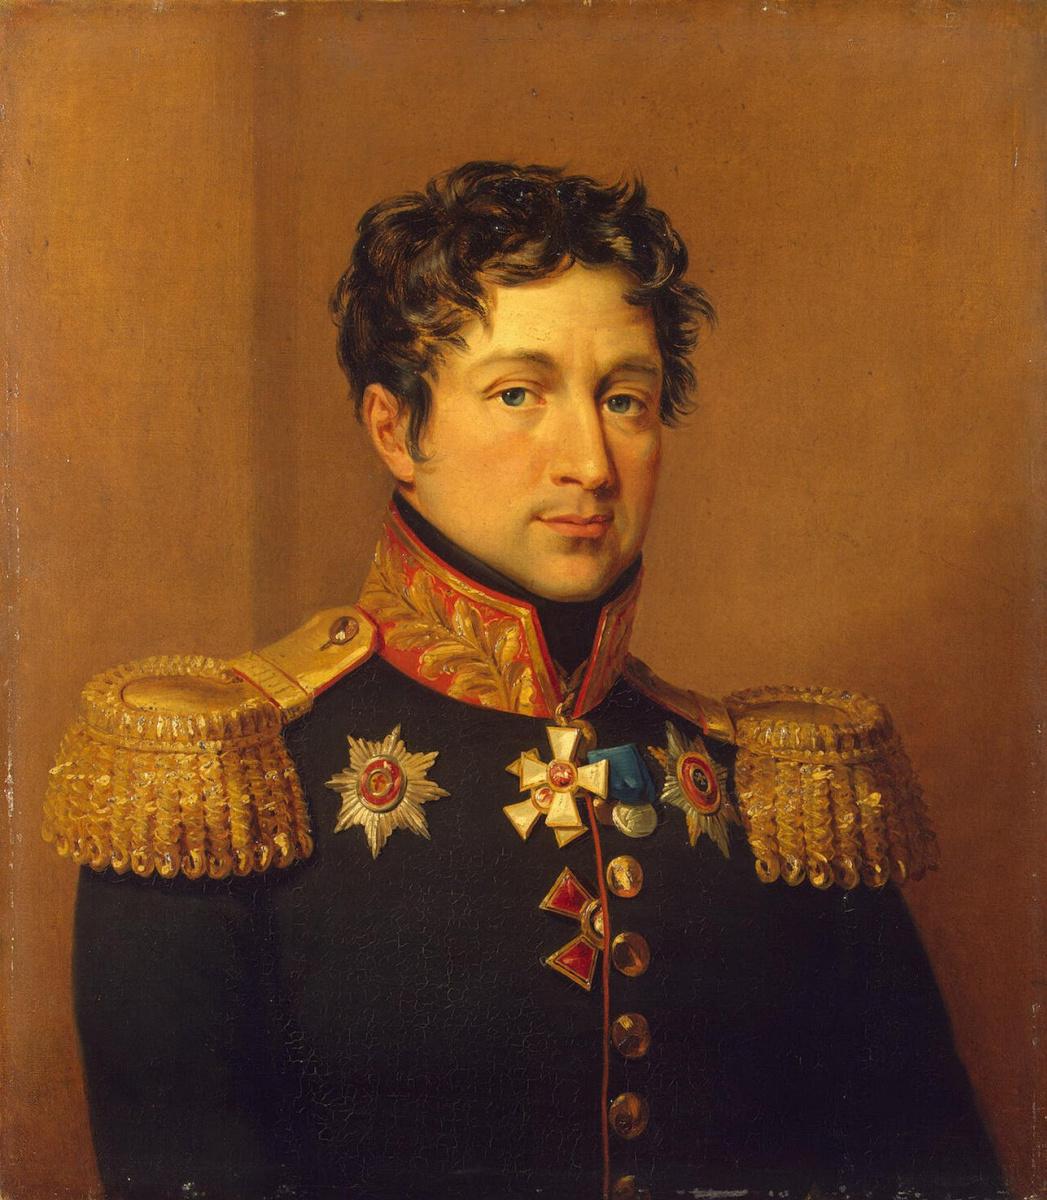 Джордж Доу. Портрет Захара Дмитриевича Олсуфьева